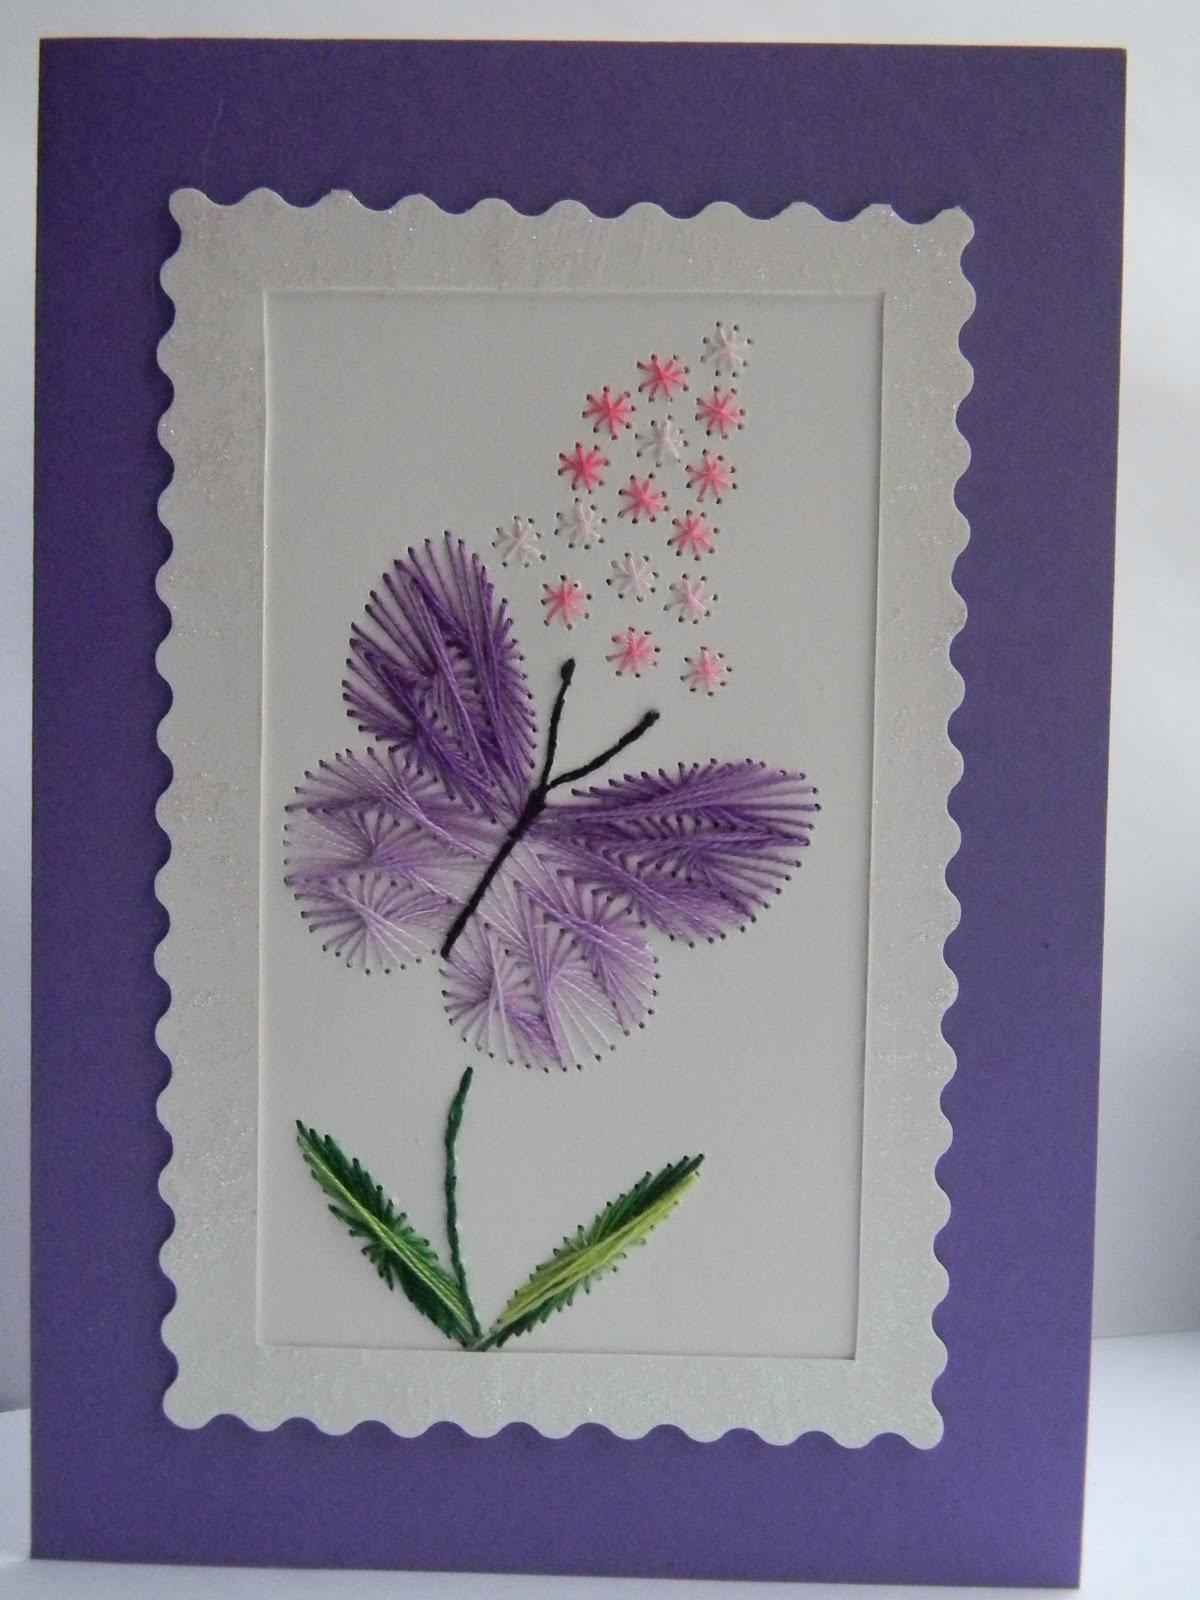 Открытка с изонити, юбилеем открытка цветами